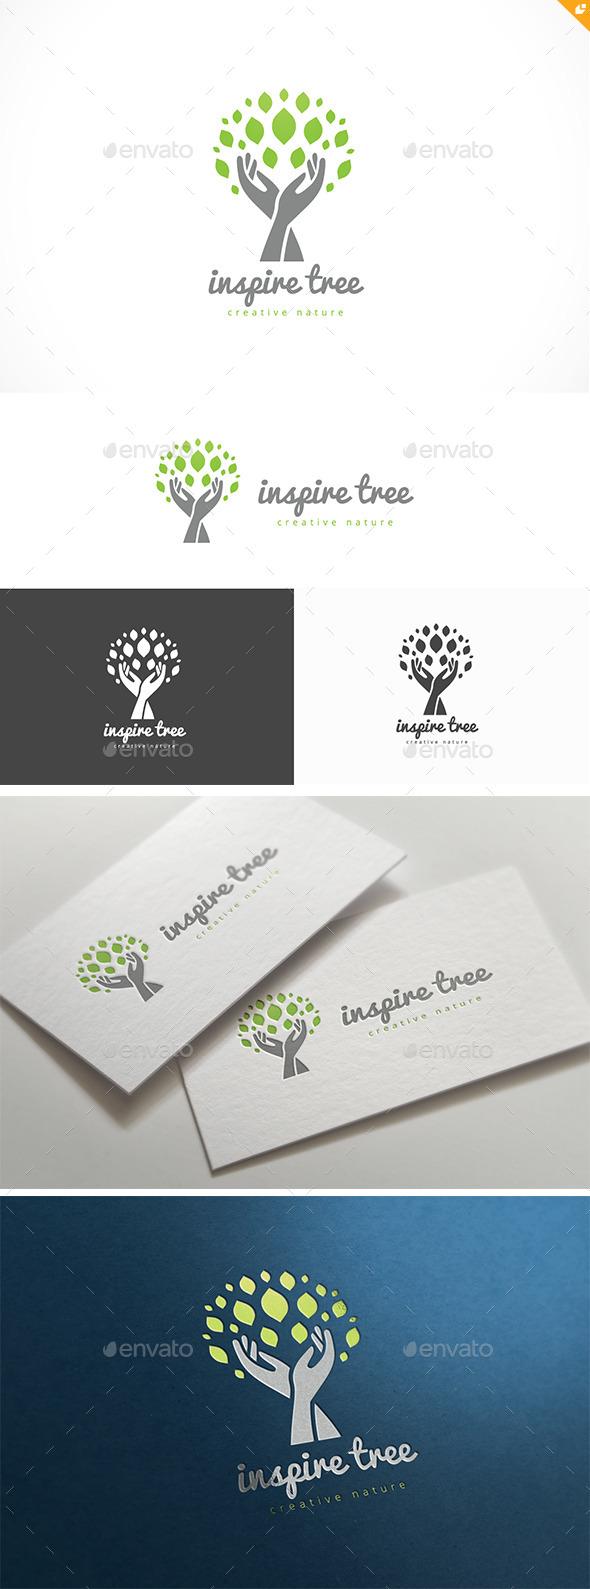 Inspire Tree - Nature Logo Templates